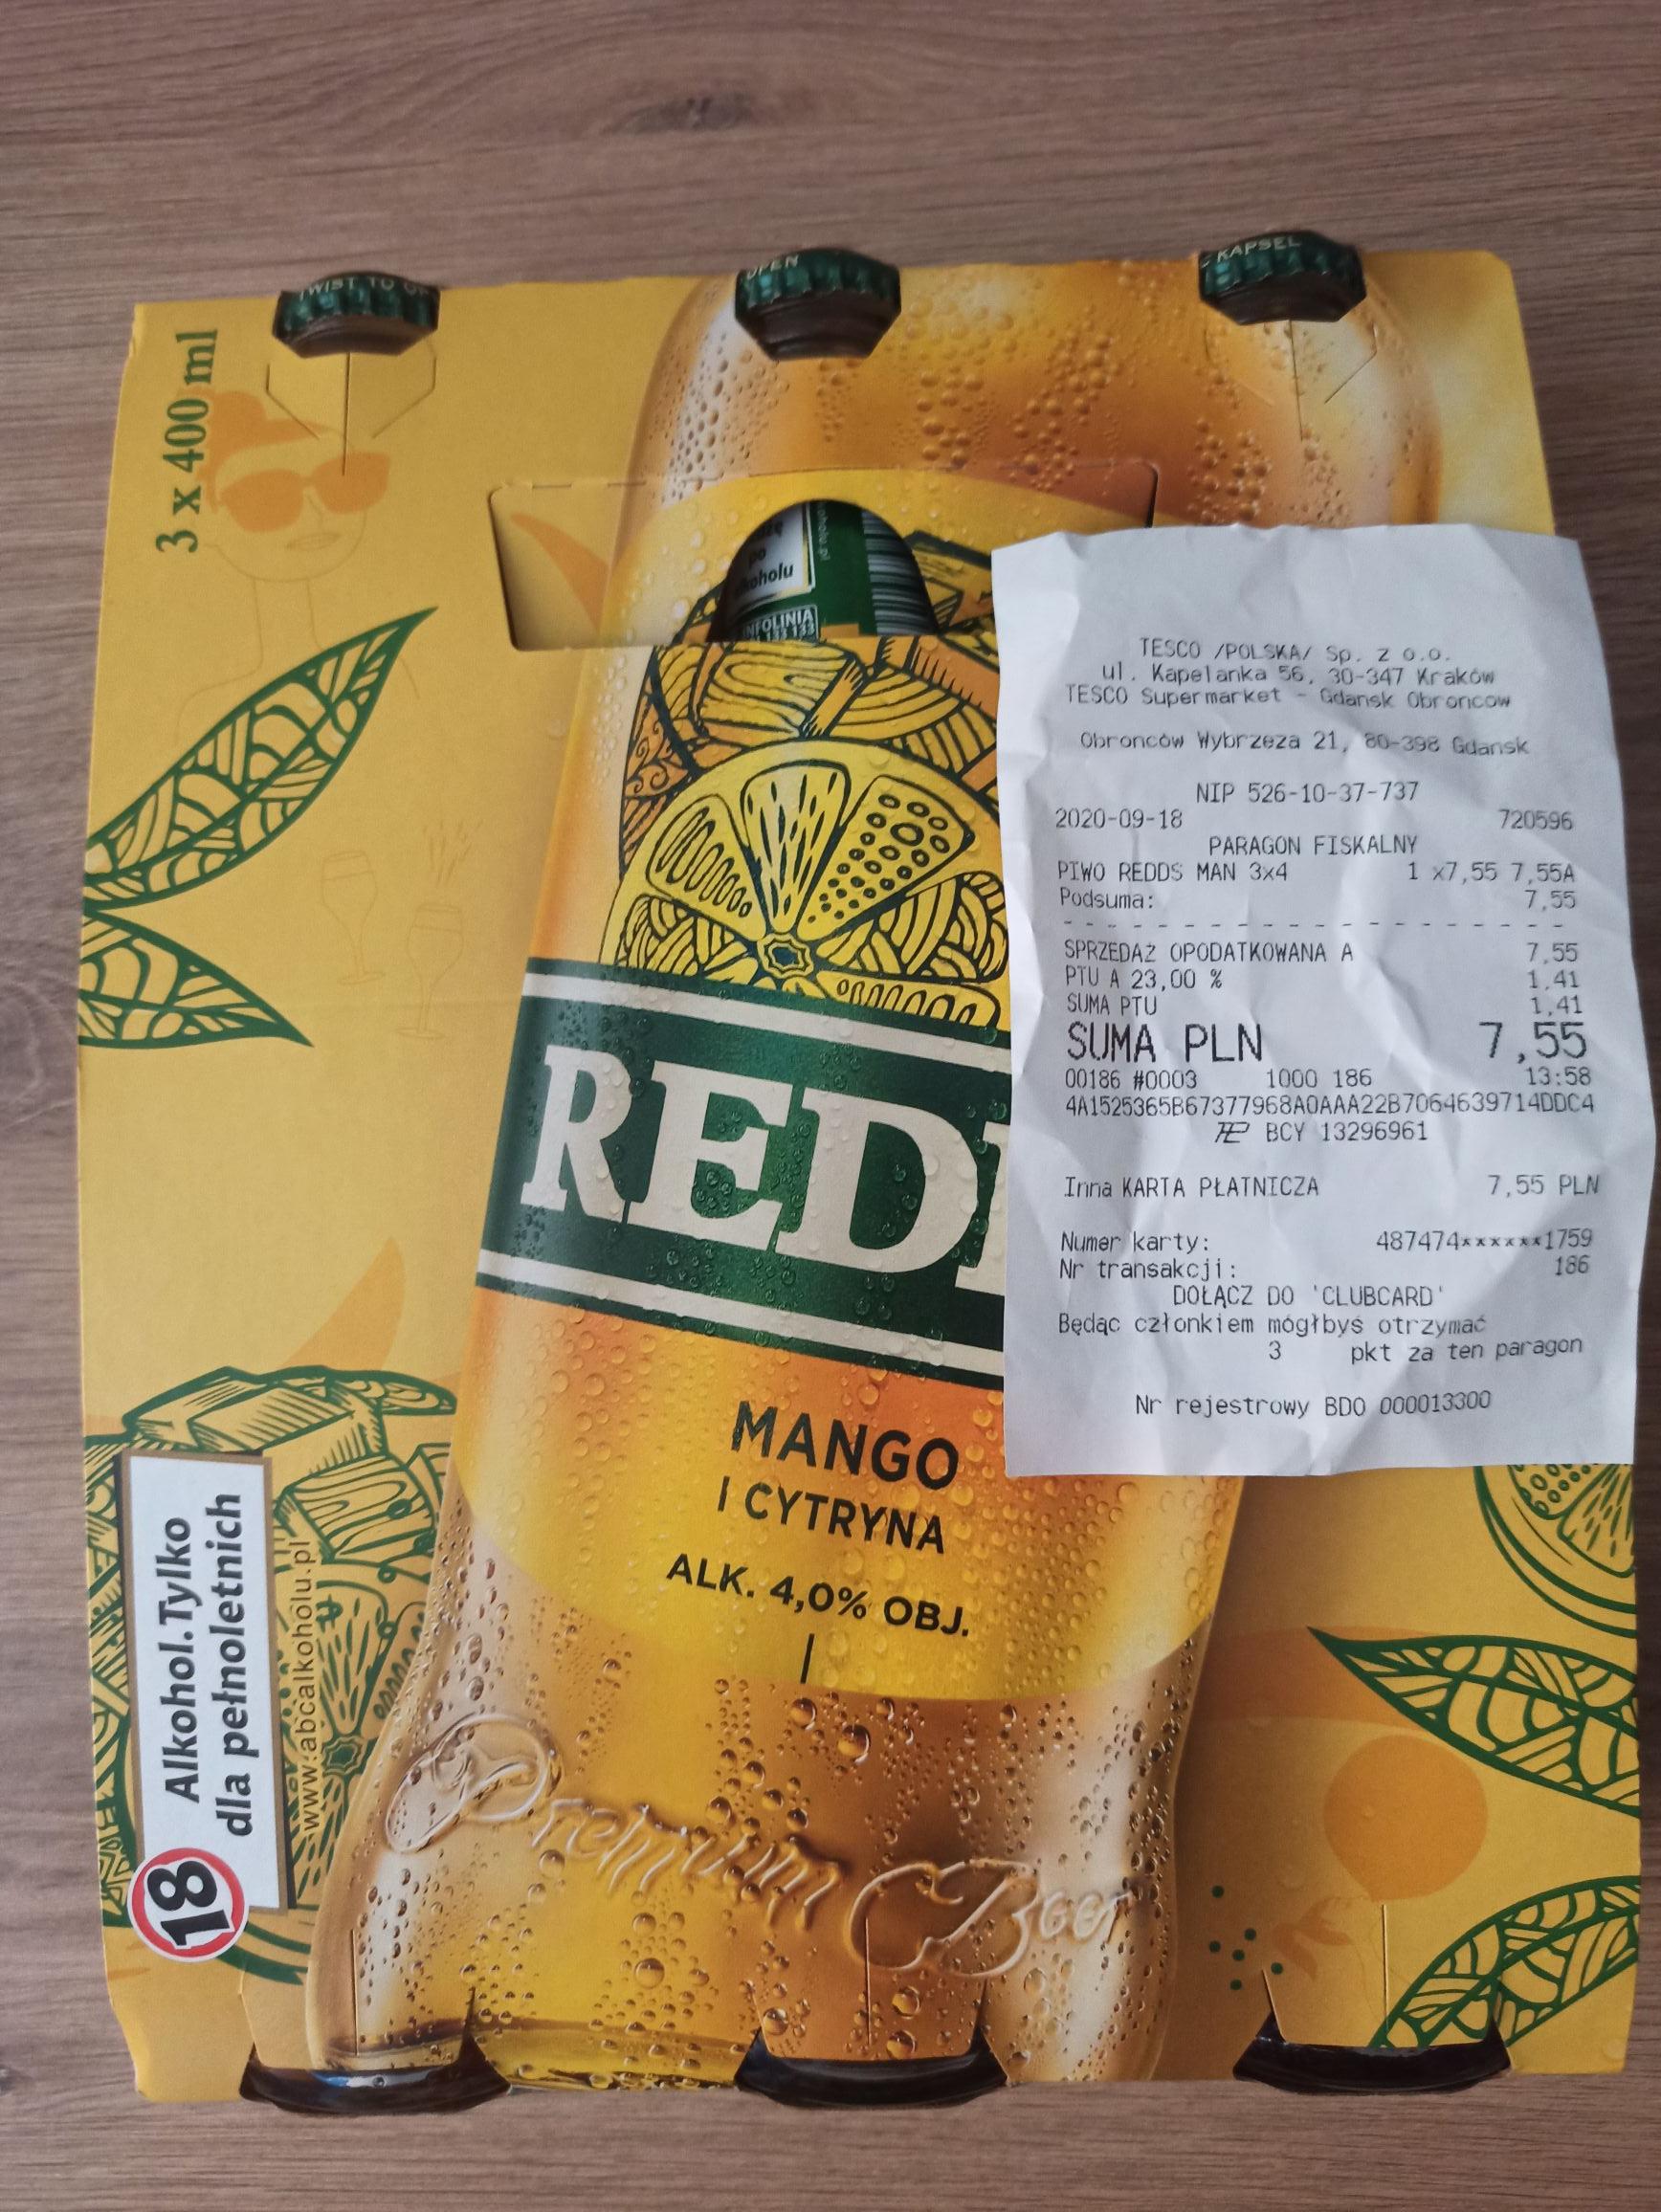 3x400 ml Redd's mango i cytryna, żurawina, jabłko